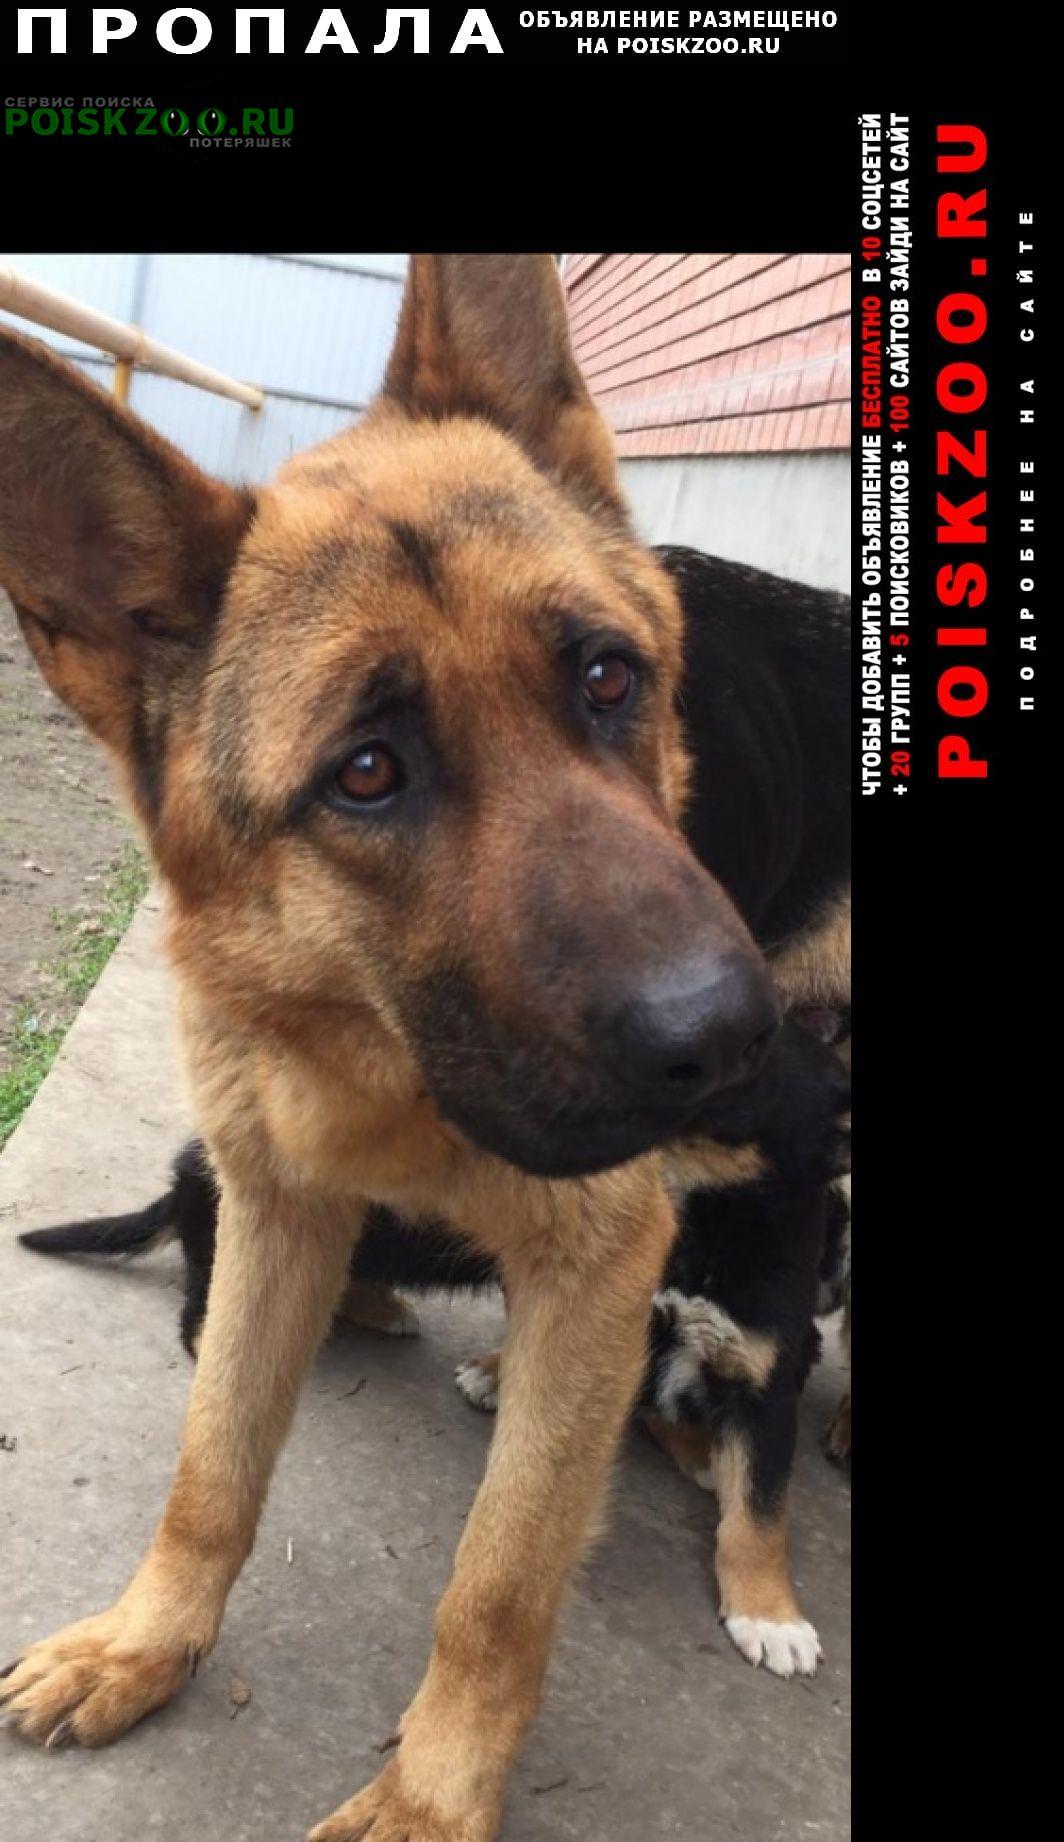 Пропала собака немецкая овчарка Таганрог